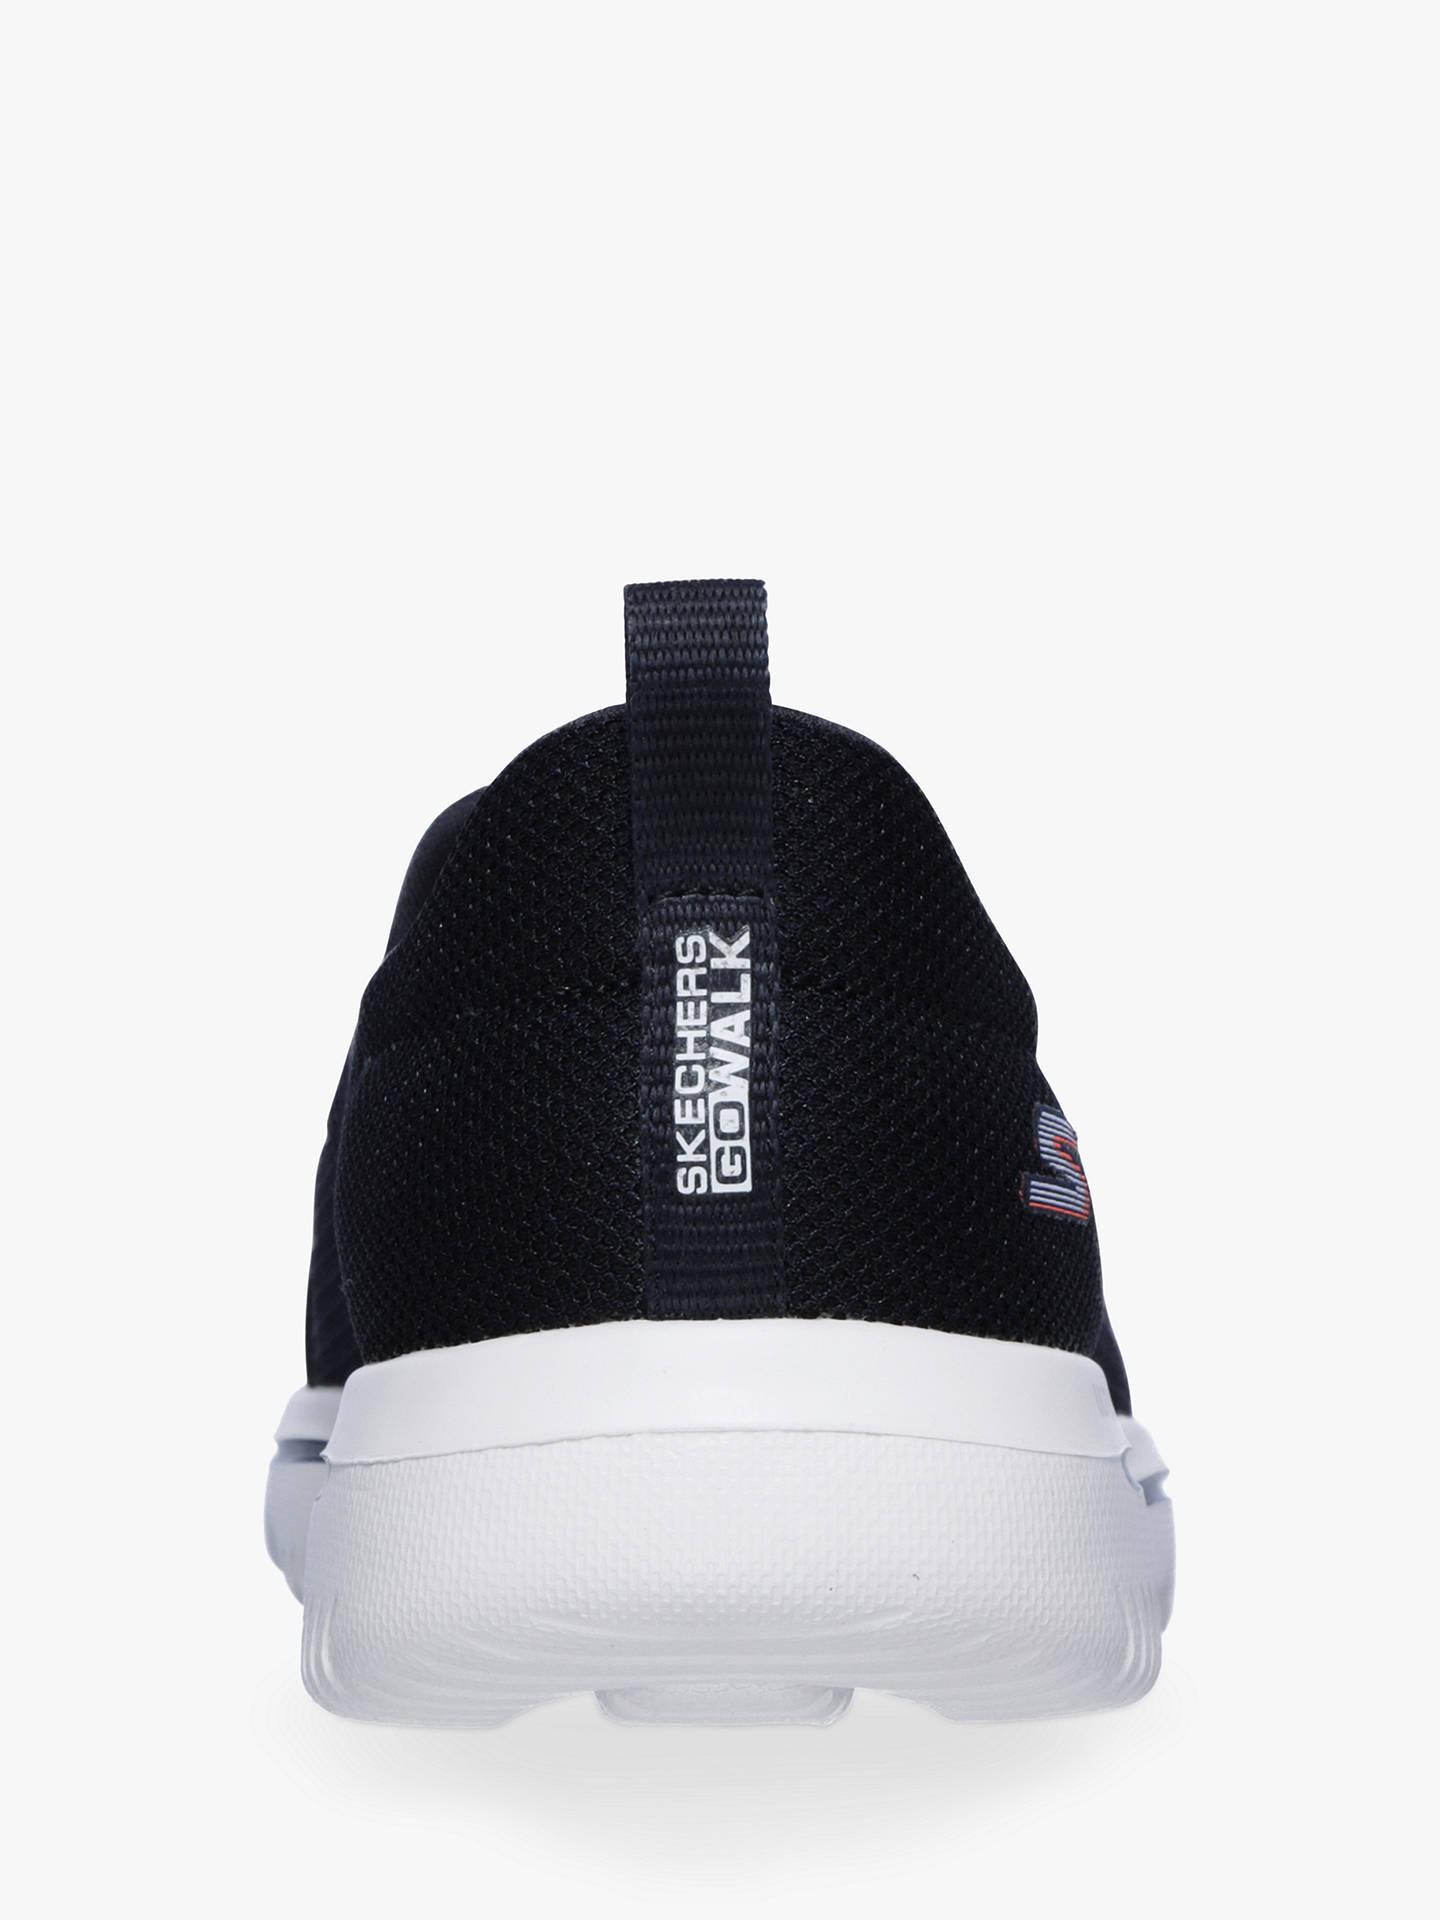 skechers non slip shoes canada